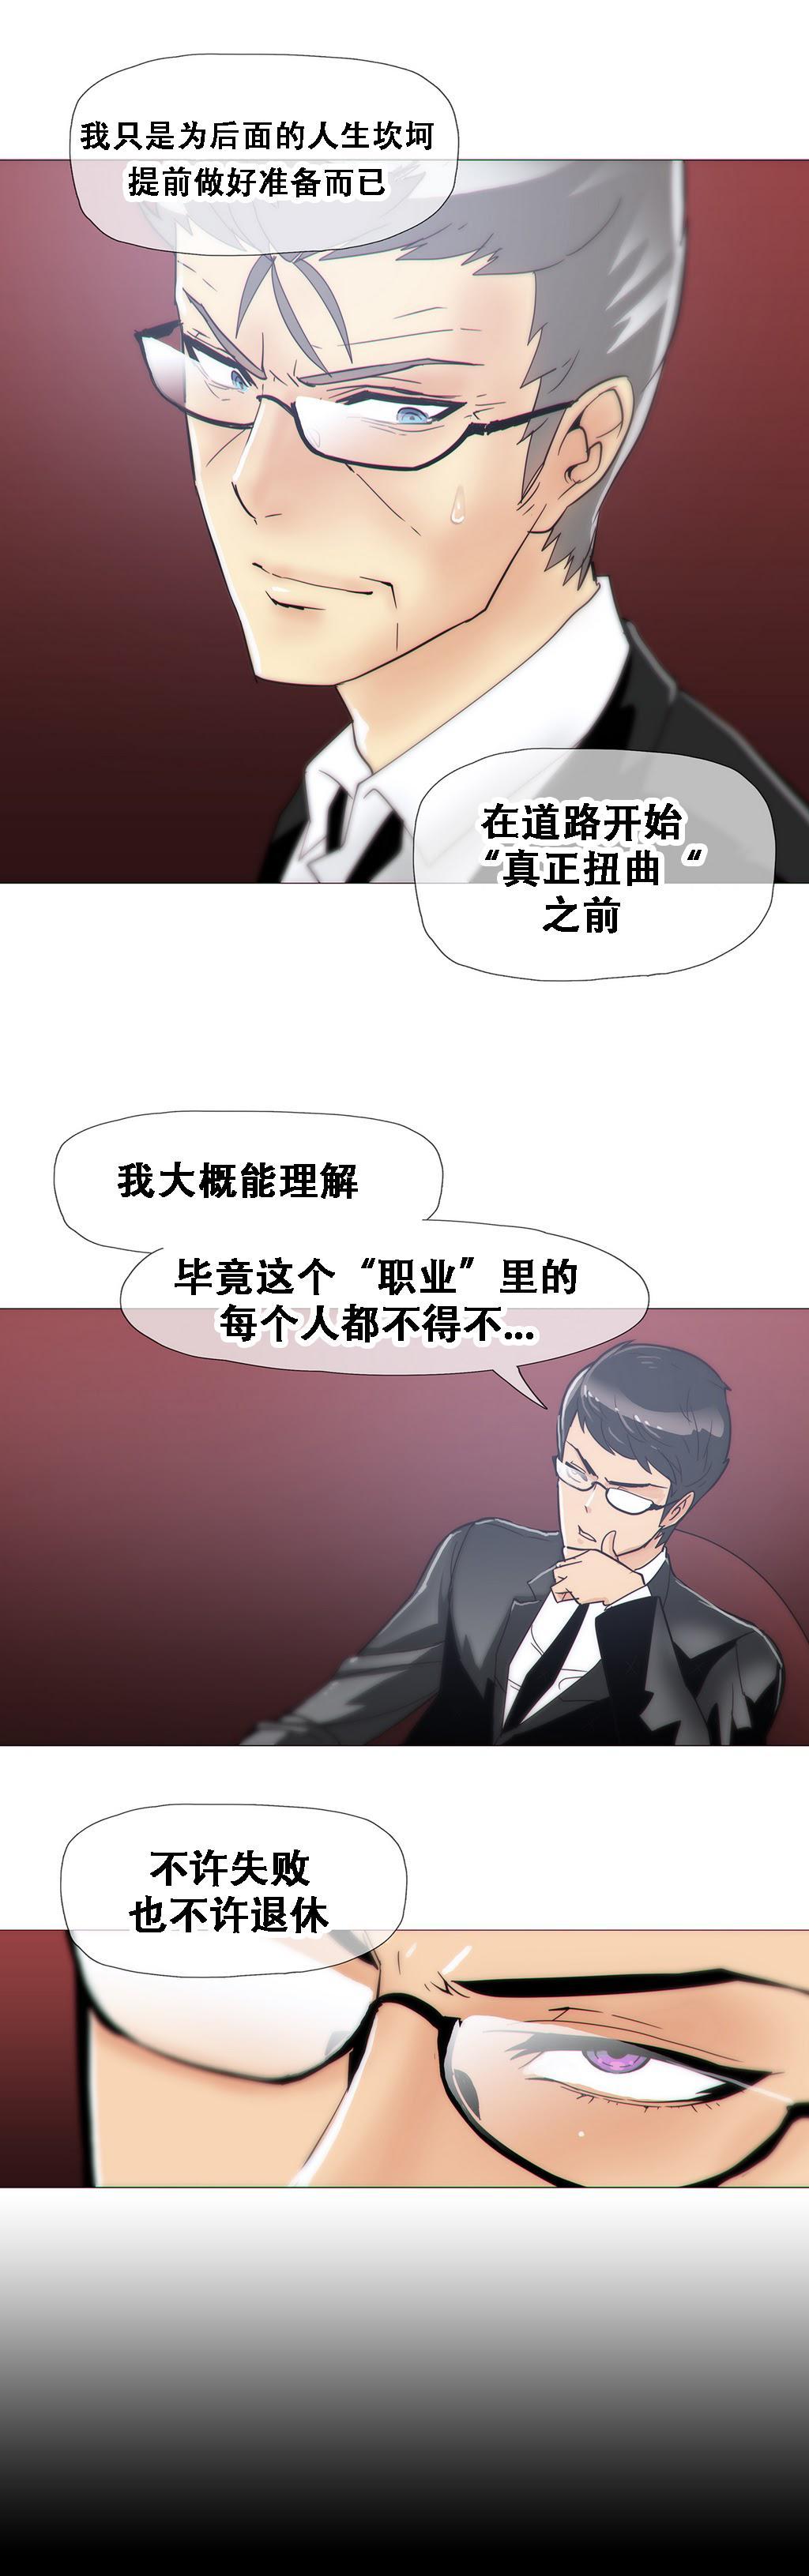 HouseHold Affairs 【卞赤鲤个人汉化】1~21话(持续更新中) 346